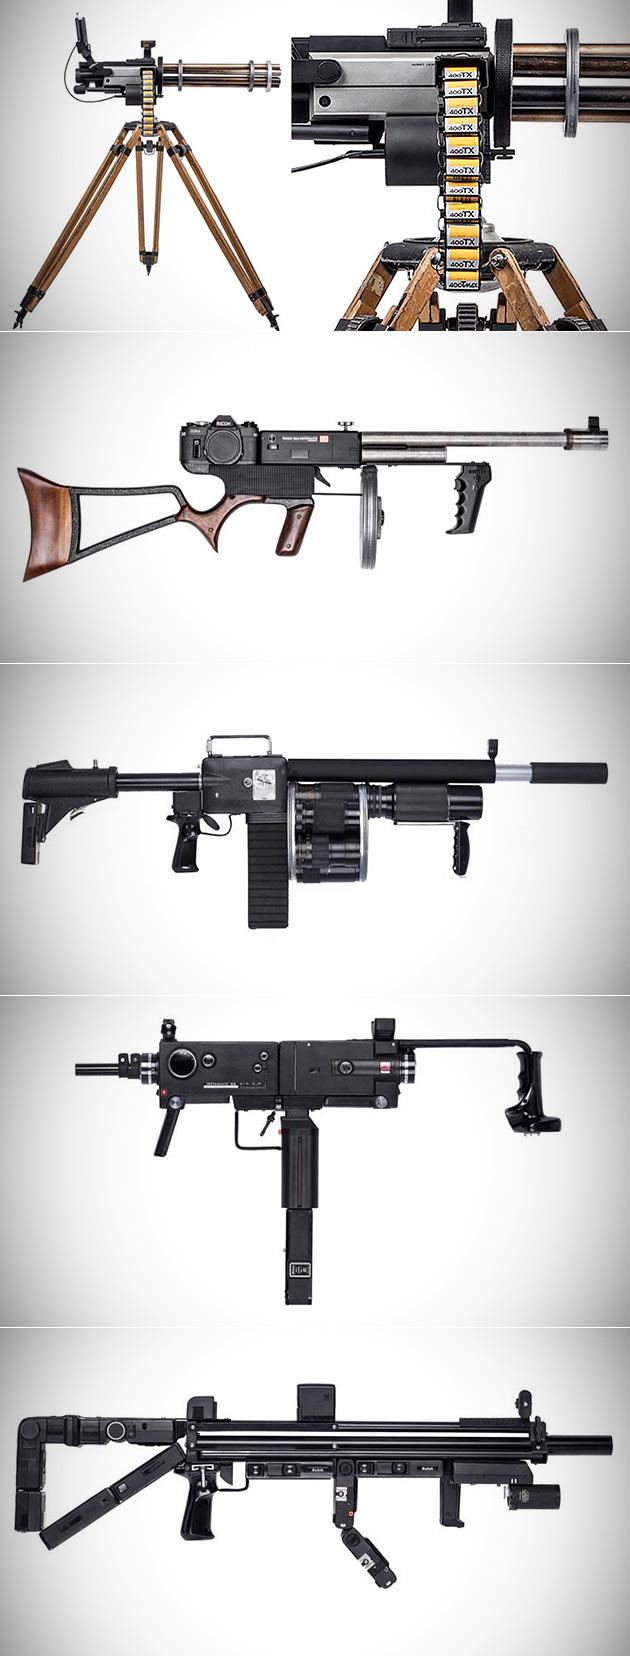 Camera Gear Guns